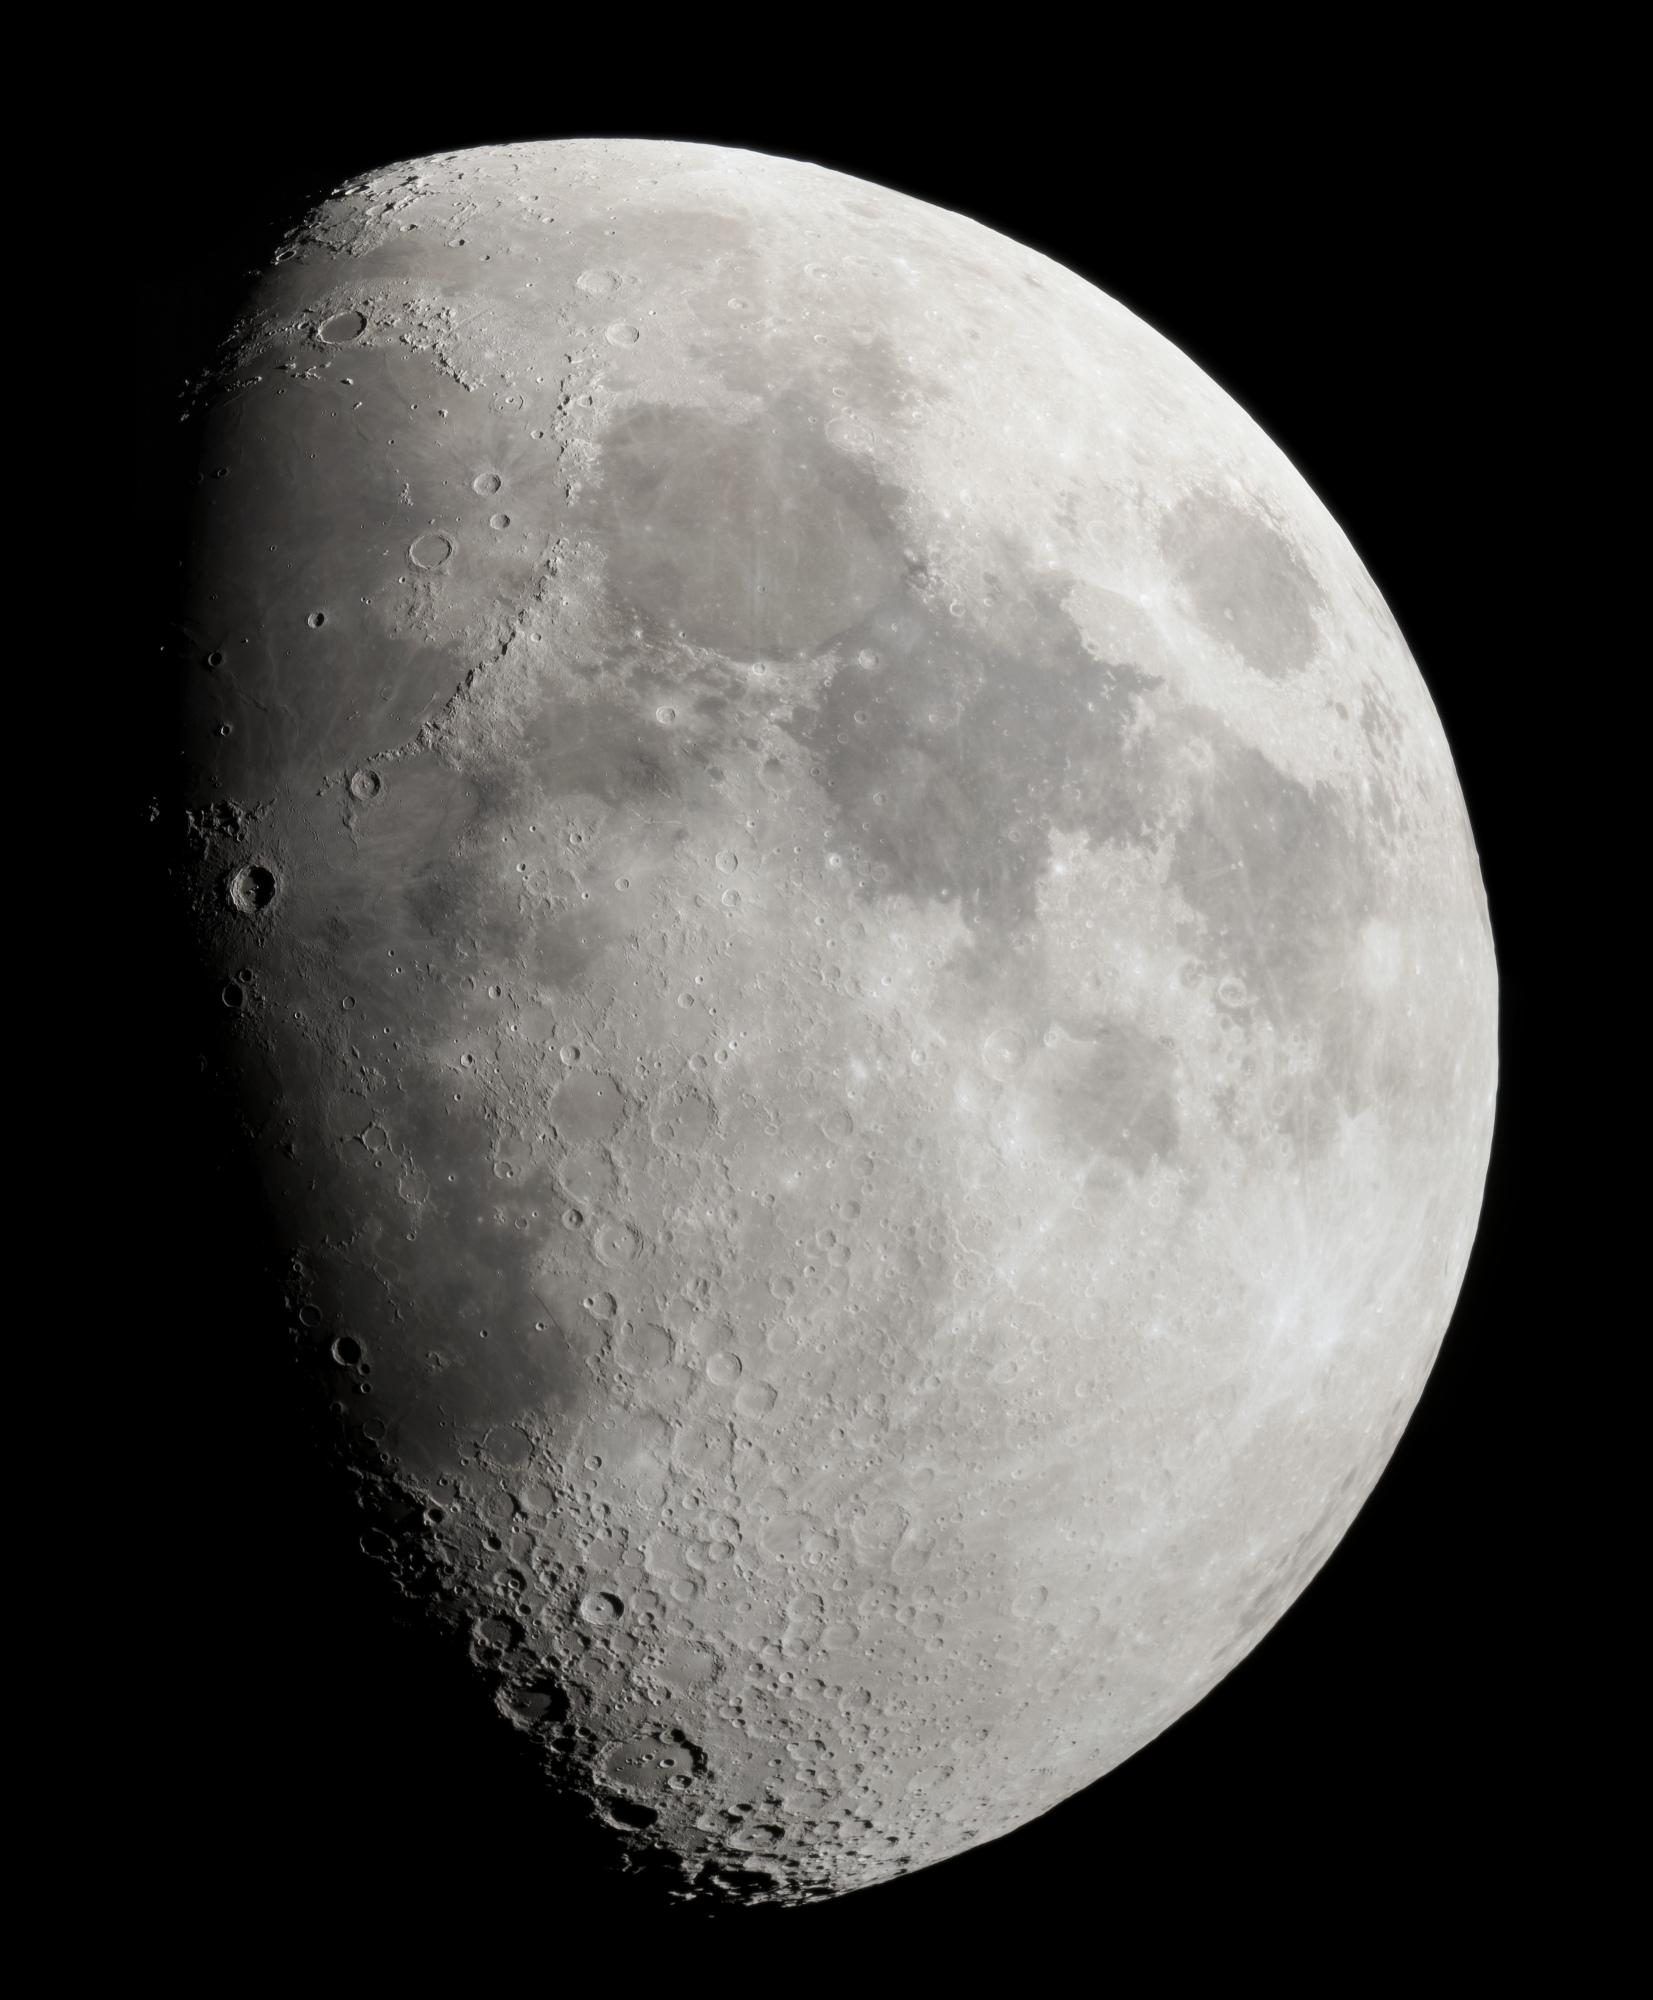 5ce15b37168ef_lune130519(T250-B2x-A7s-100).thumb.jpg.3f8c288470effd2f64e8facbd69169a3.jpg